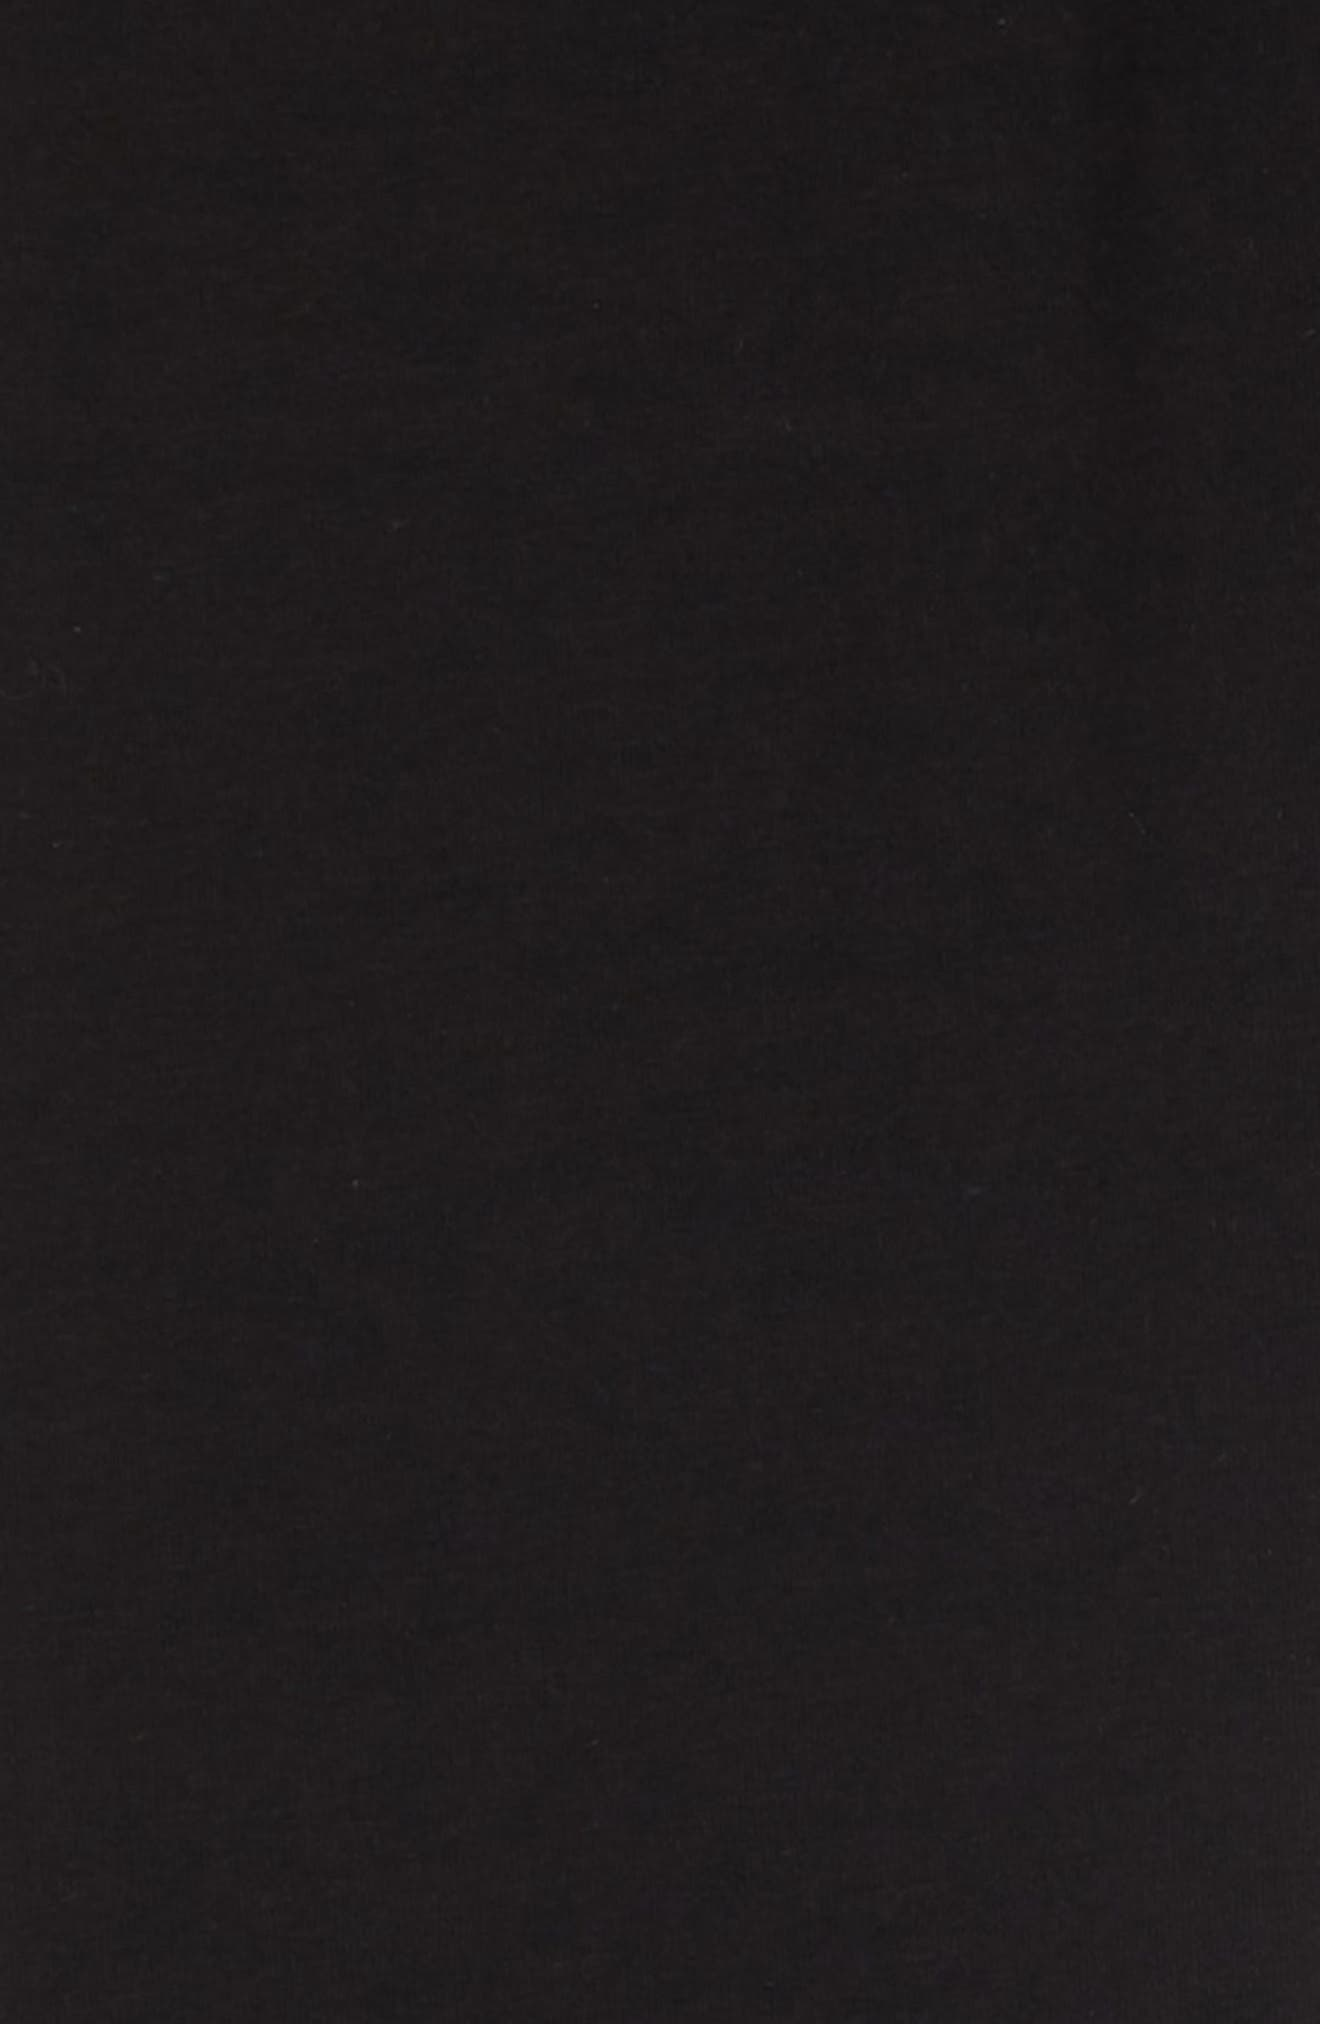 Sportswear Swoosh Leggings,                             Alternate thumbnail 2, color,                             BLACK/ WHITE